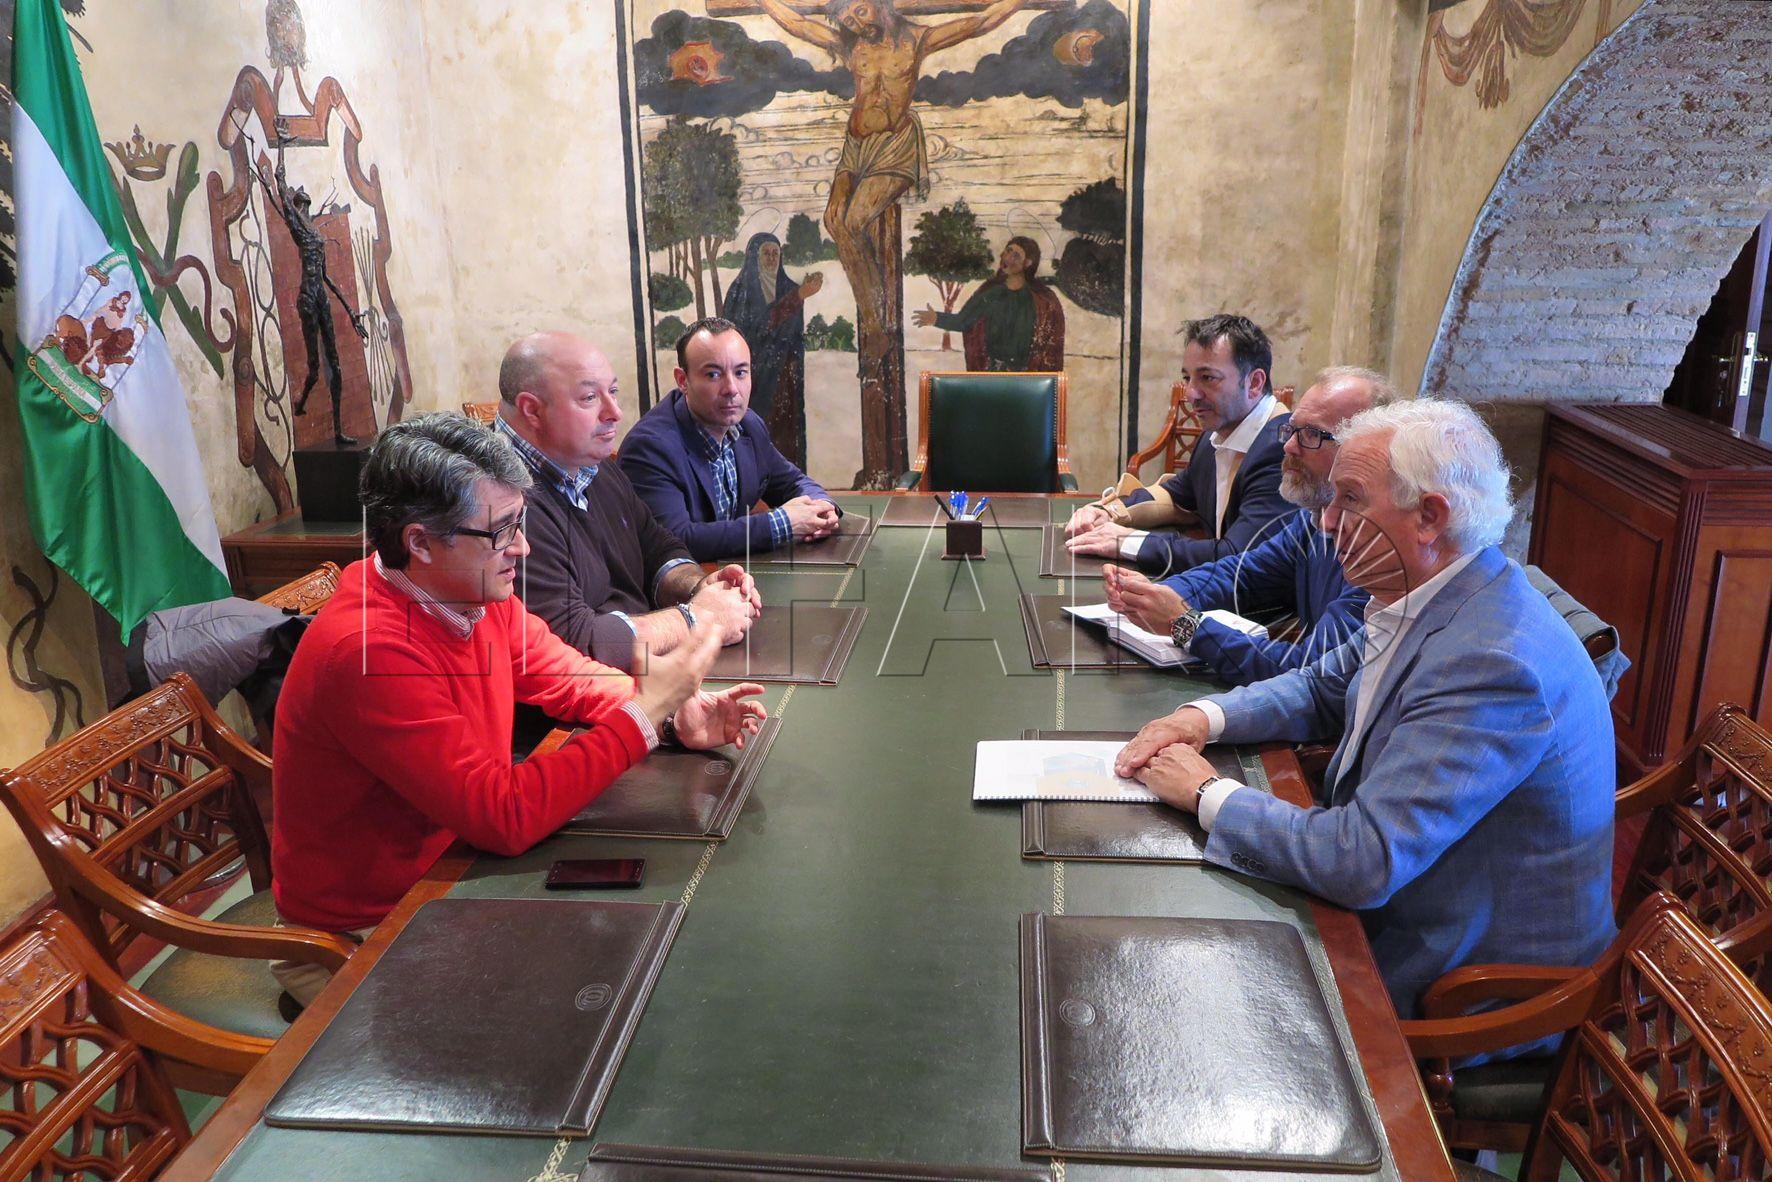 Preparando la I Copa Intercontinental de Vela Marbella-Ceuta